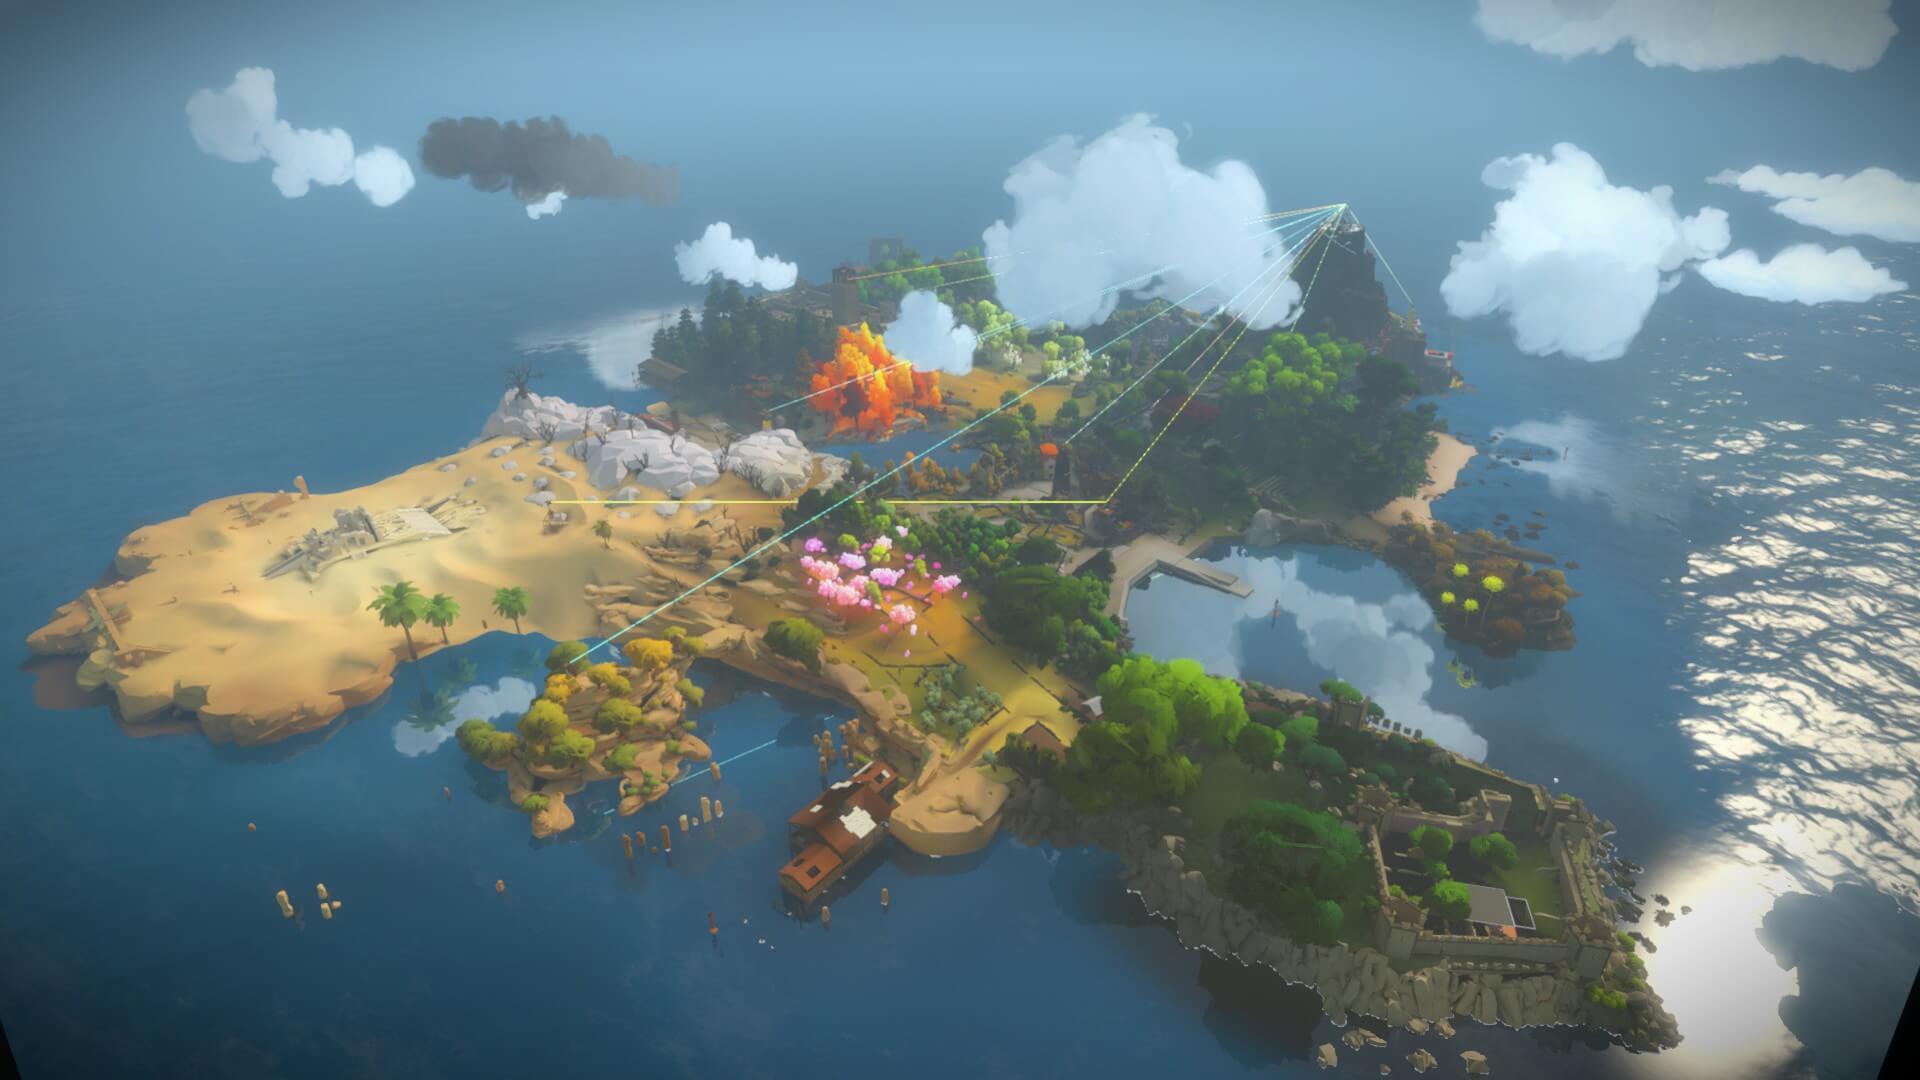 A mysterious island.